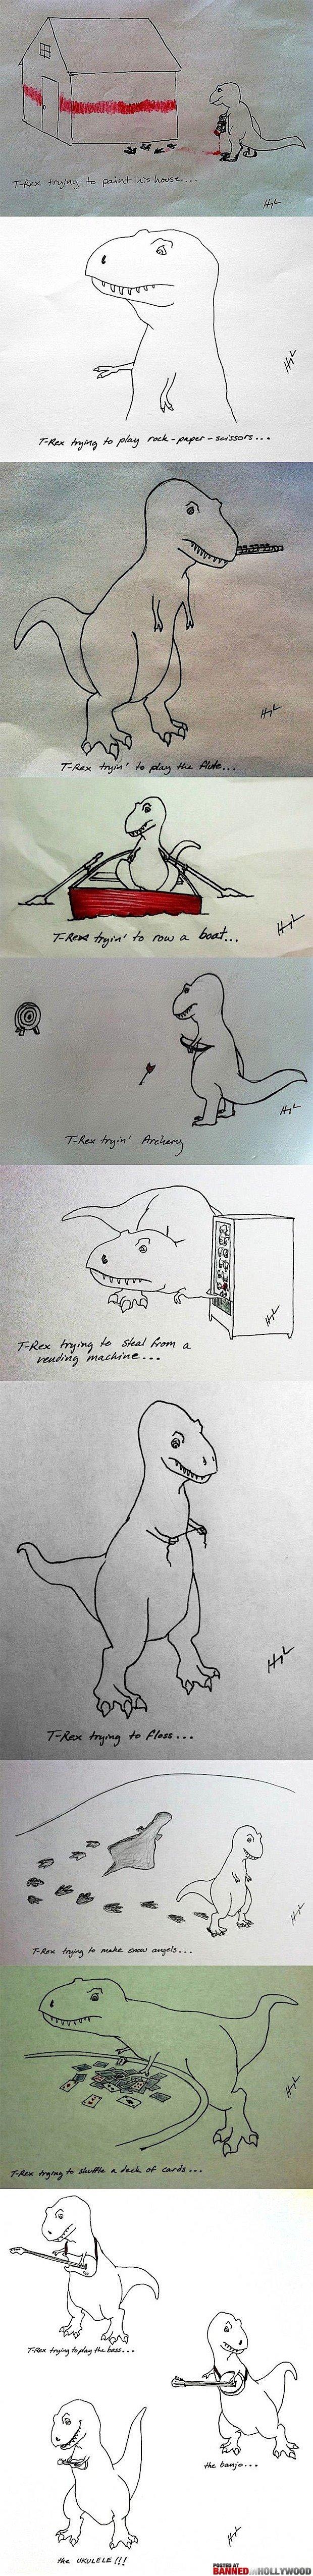 Sad Dinosaur Happy Dinosaur. .. What a heartwarming ending to a tragic tale